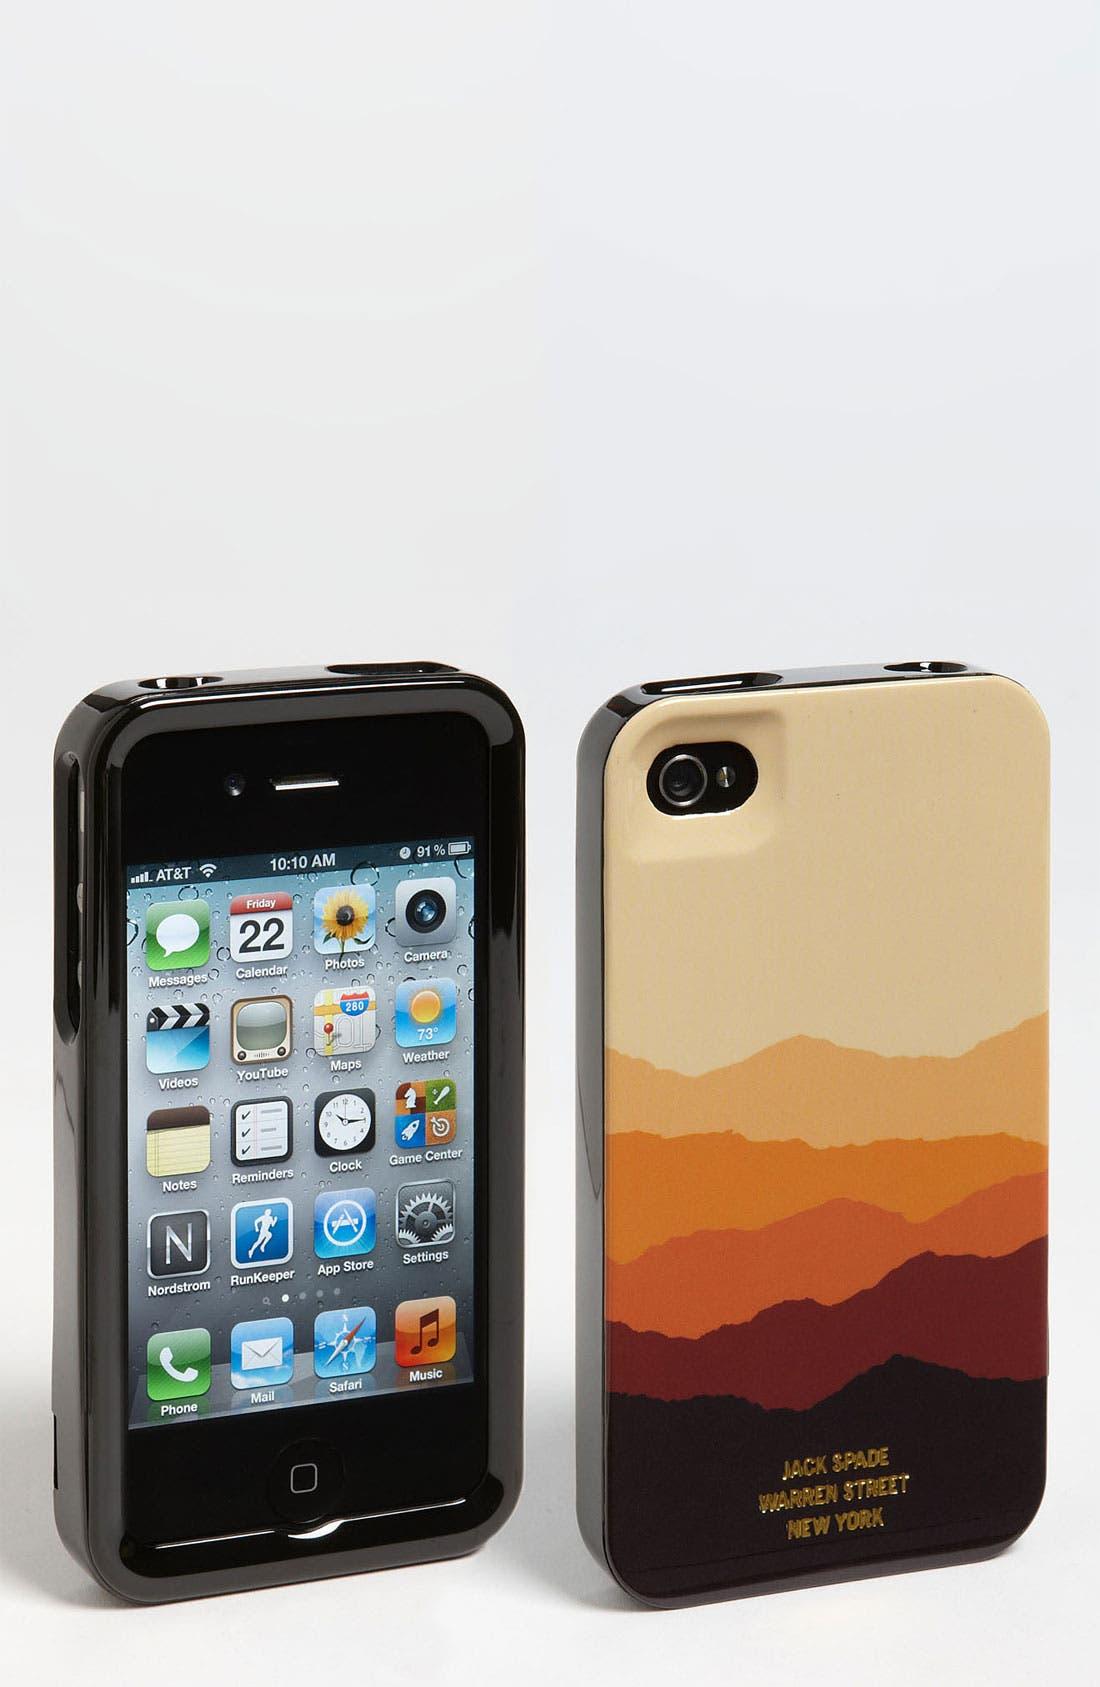 Main Image - Jack Spade 'Mountain' iPhone 4 & 4S Case